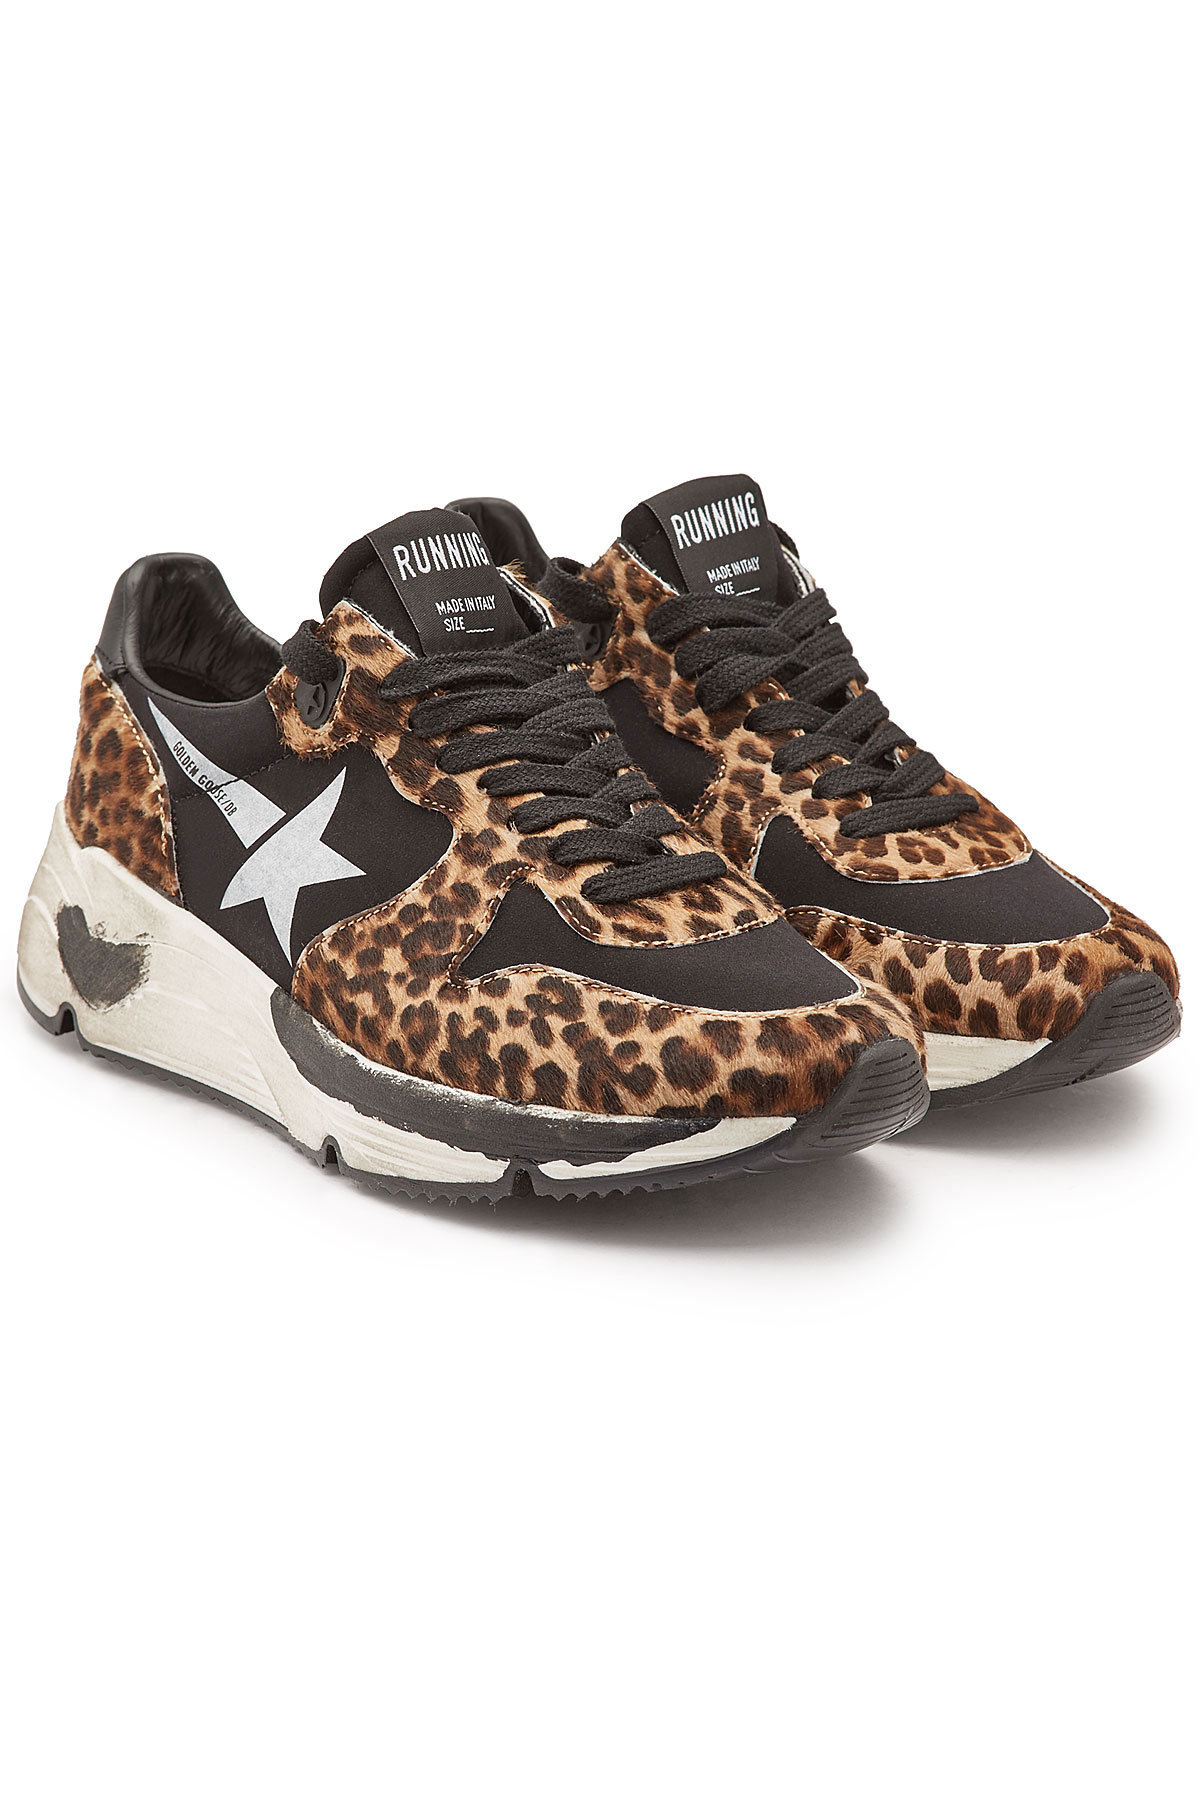 69ee36b193ef Golden Goose Running Sole Distressed Leopard-Print Calf Hair And Neoprene  Sneakers In Black